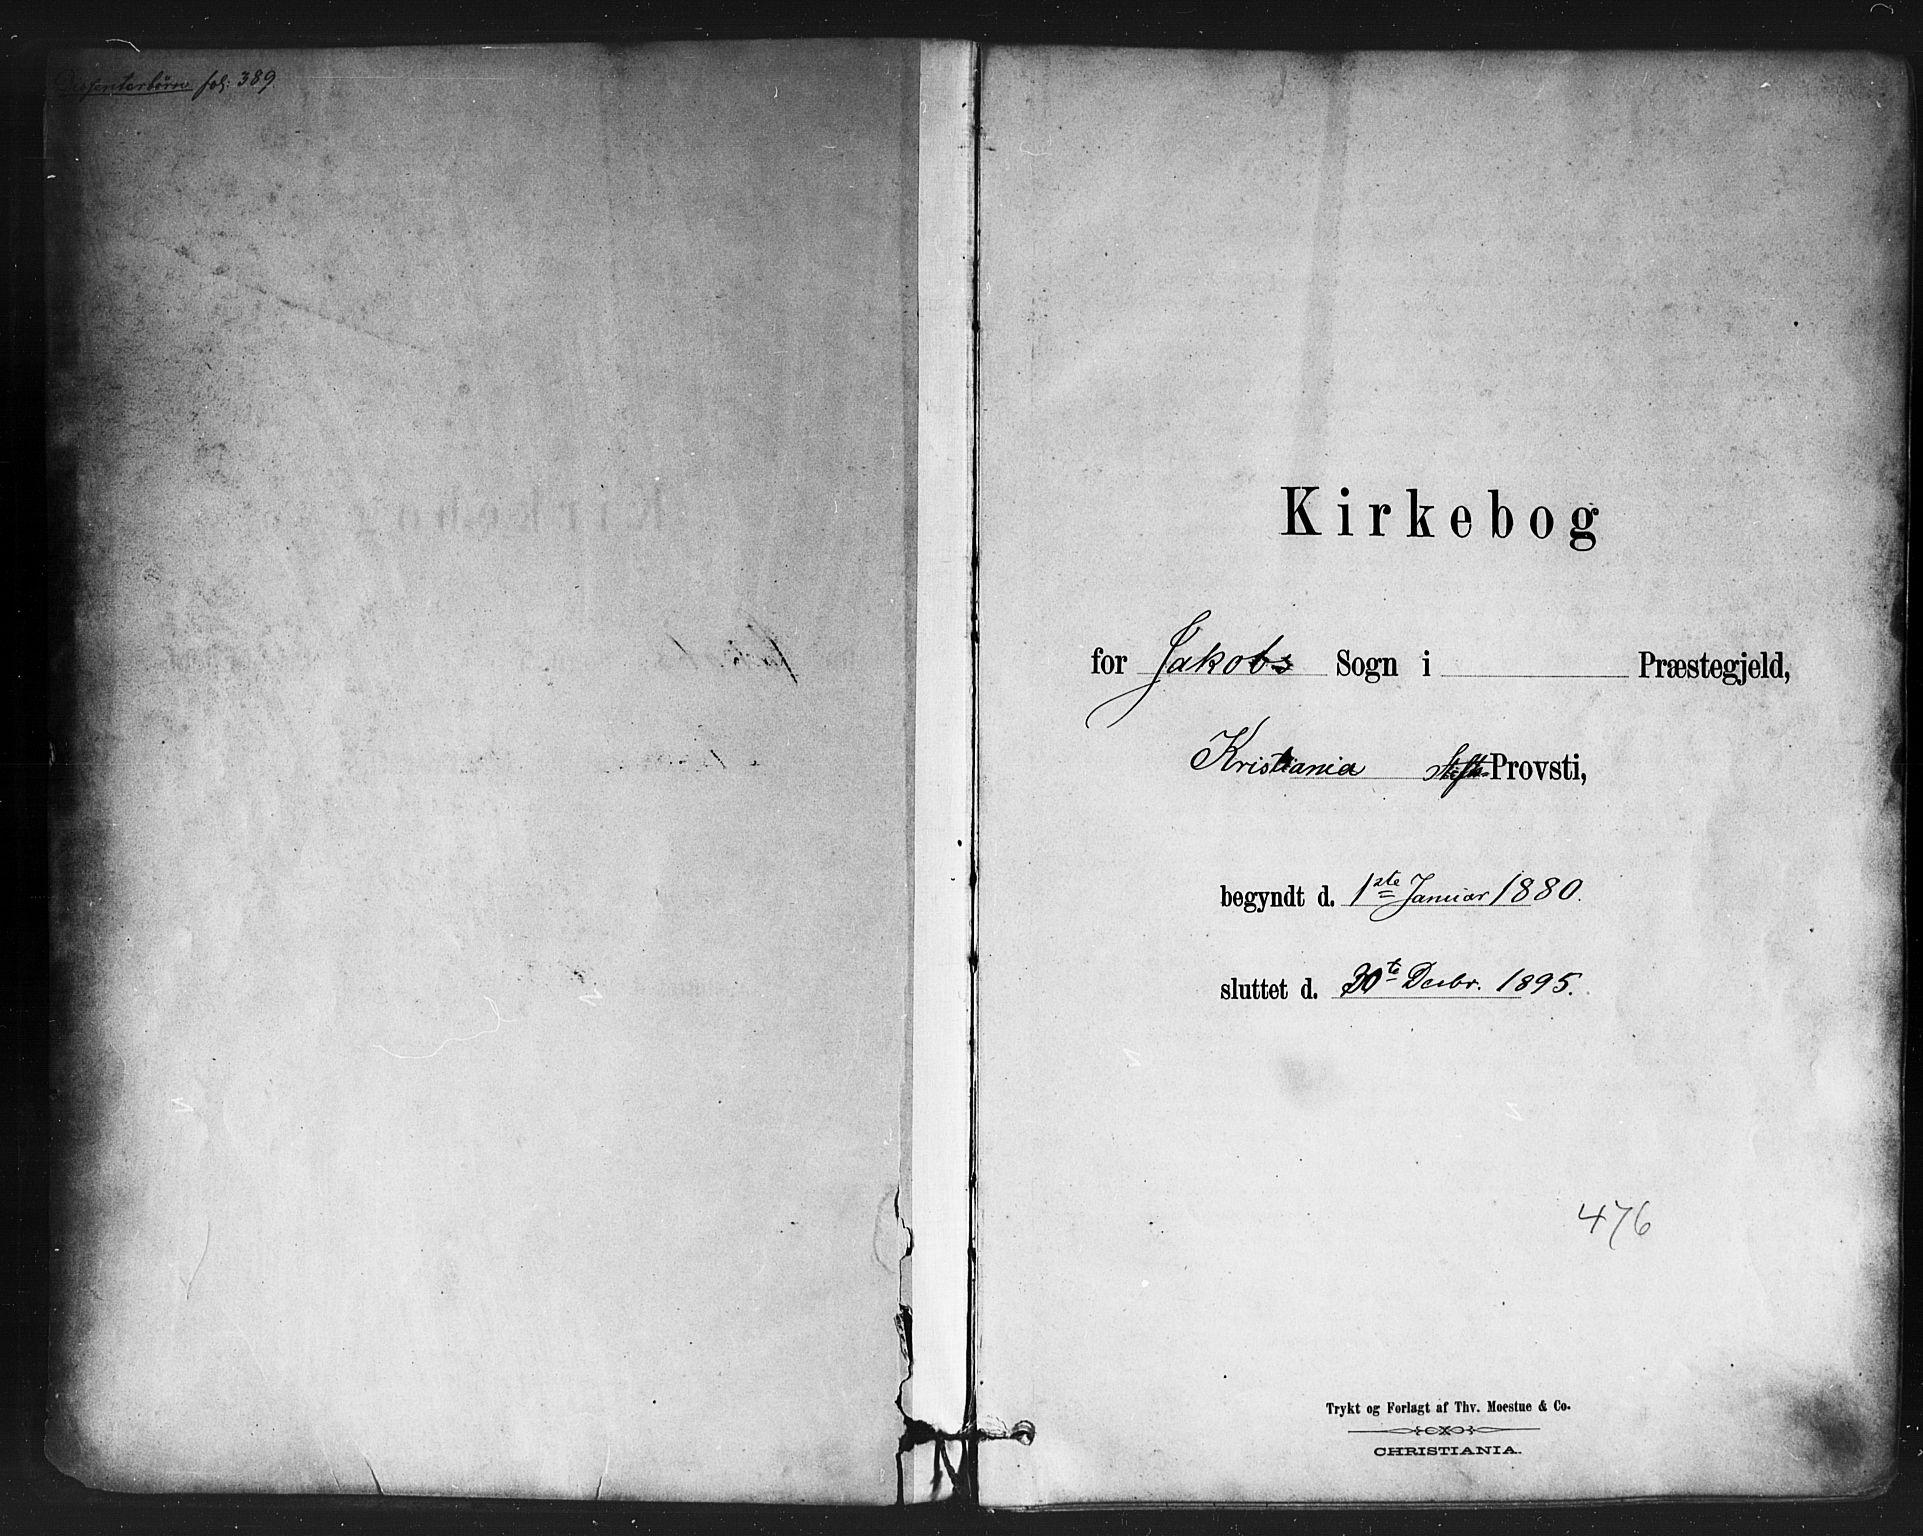 SAO, Jakob prestekontor Kirkebøker, F/Fa/L0003: Ministerialbok nr. 3, 1880-1895